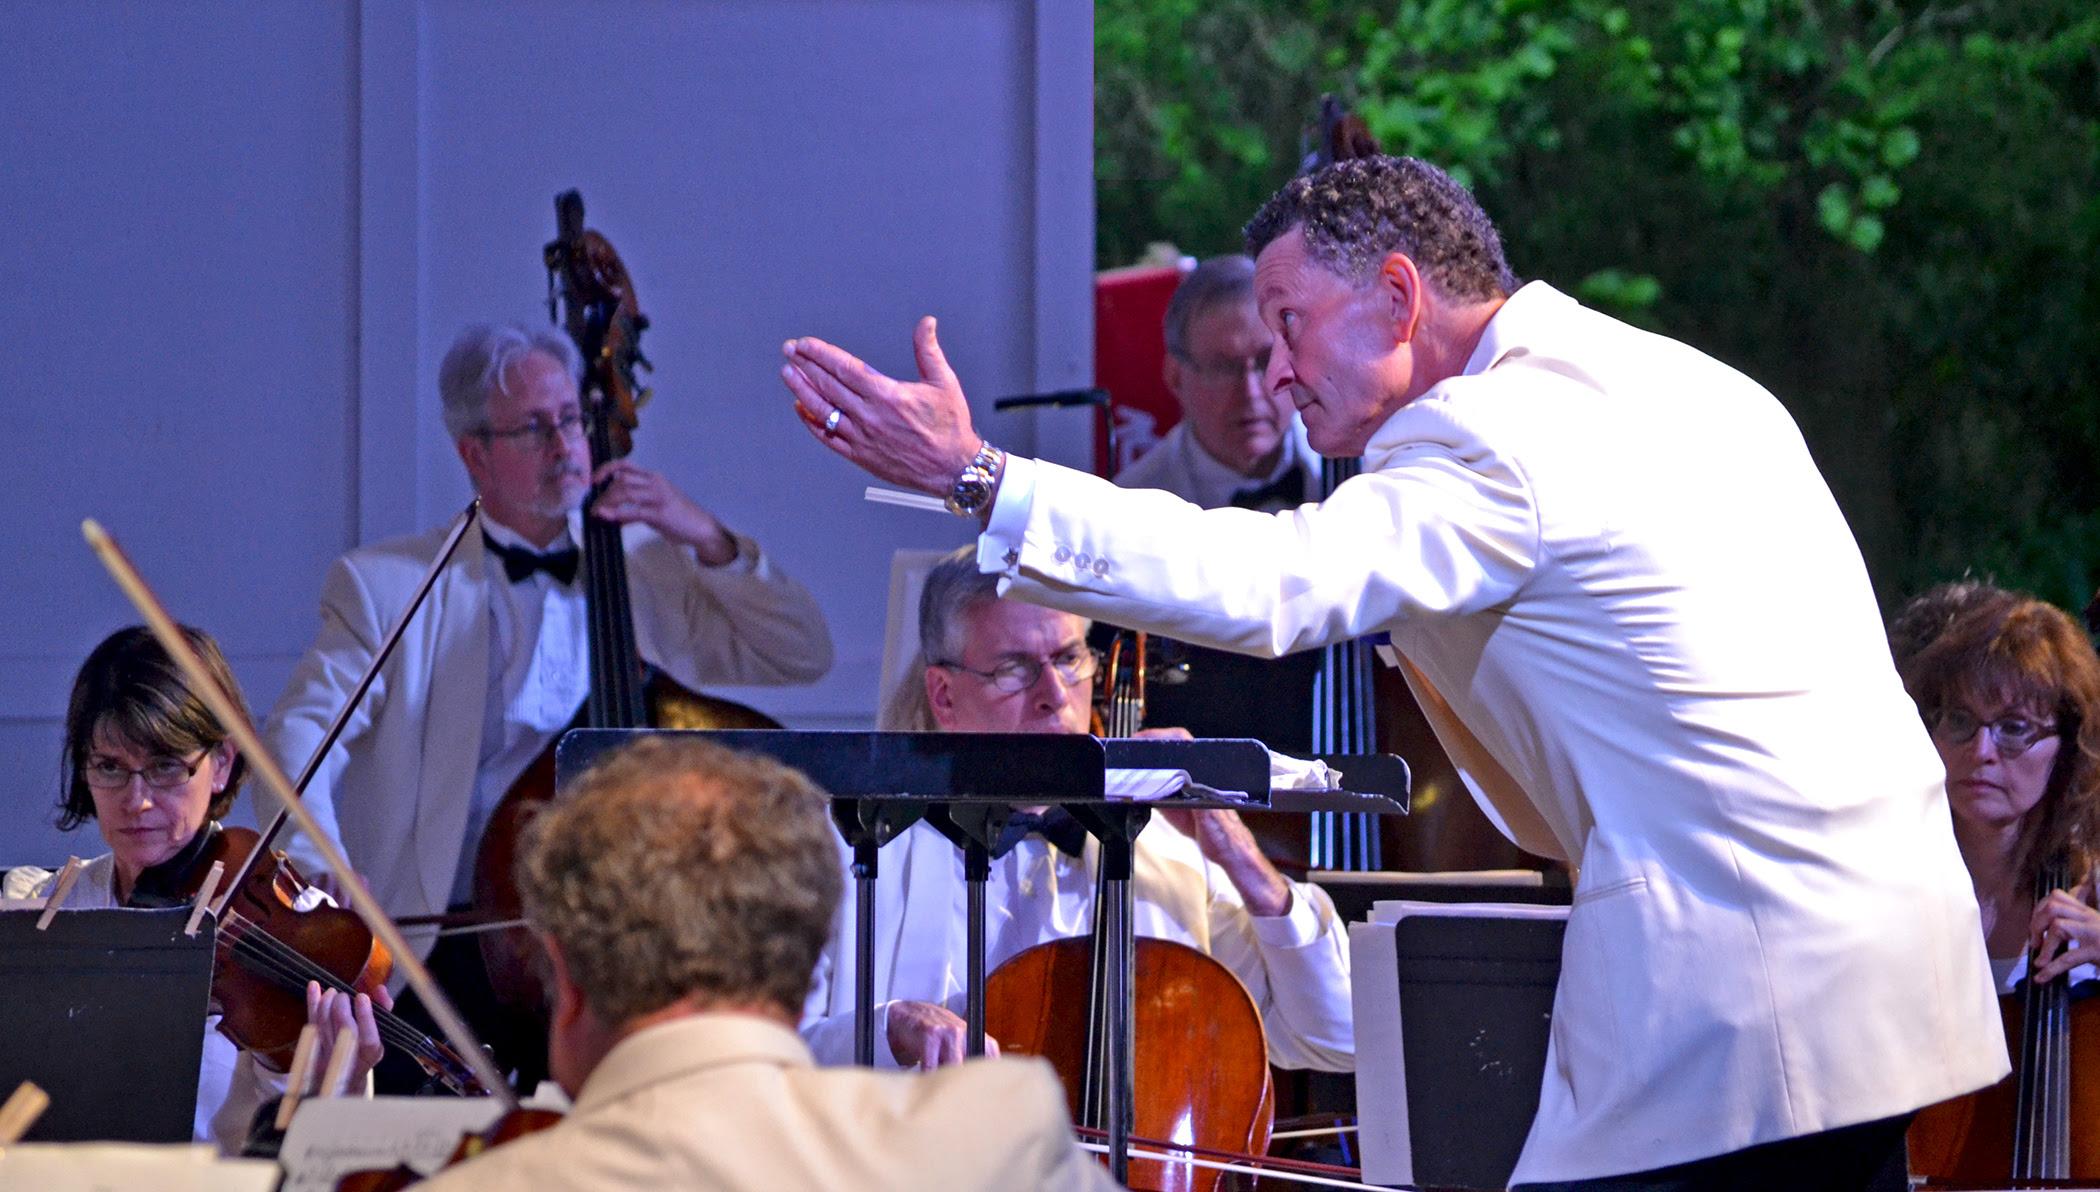 Nicholas Palmer, Conductor, EUS Orchestra